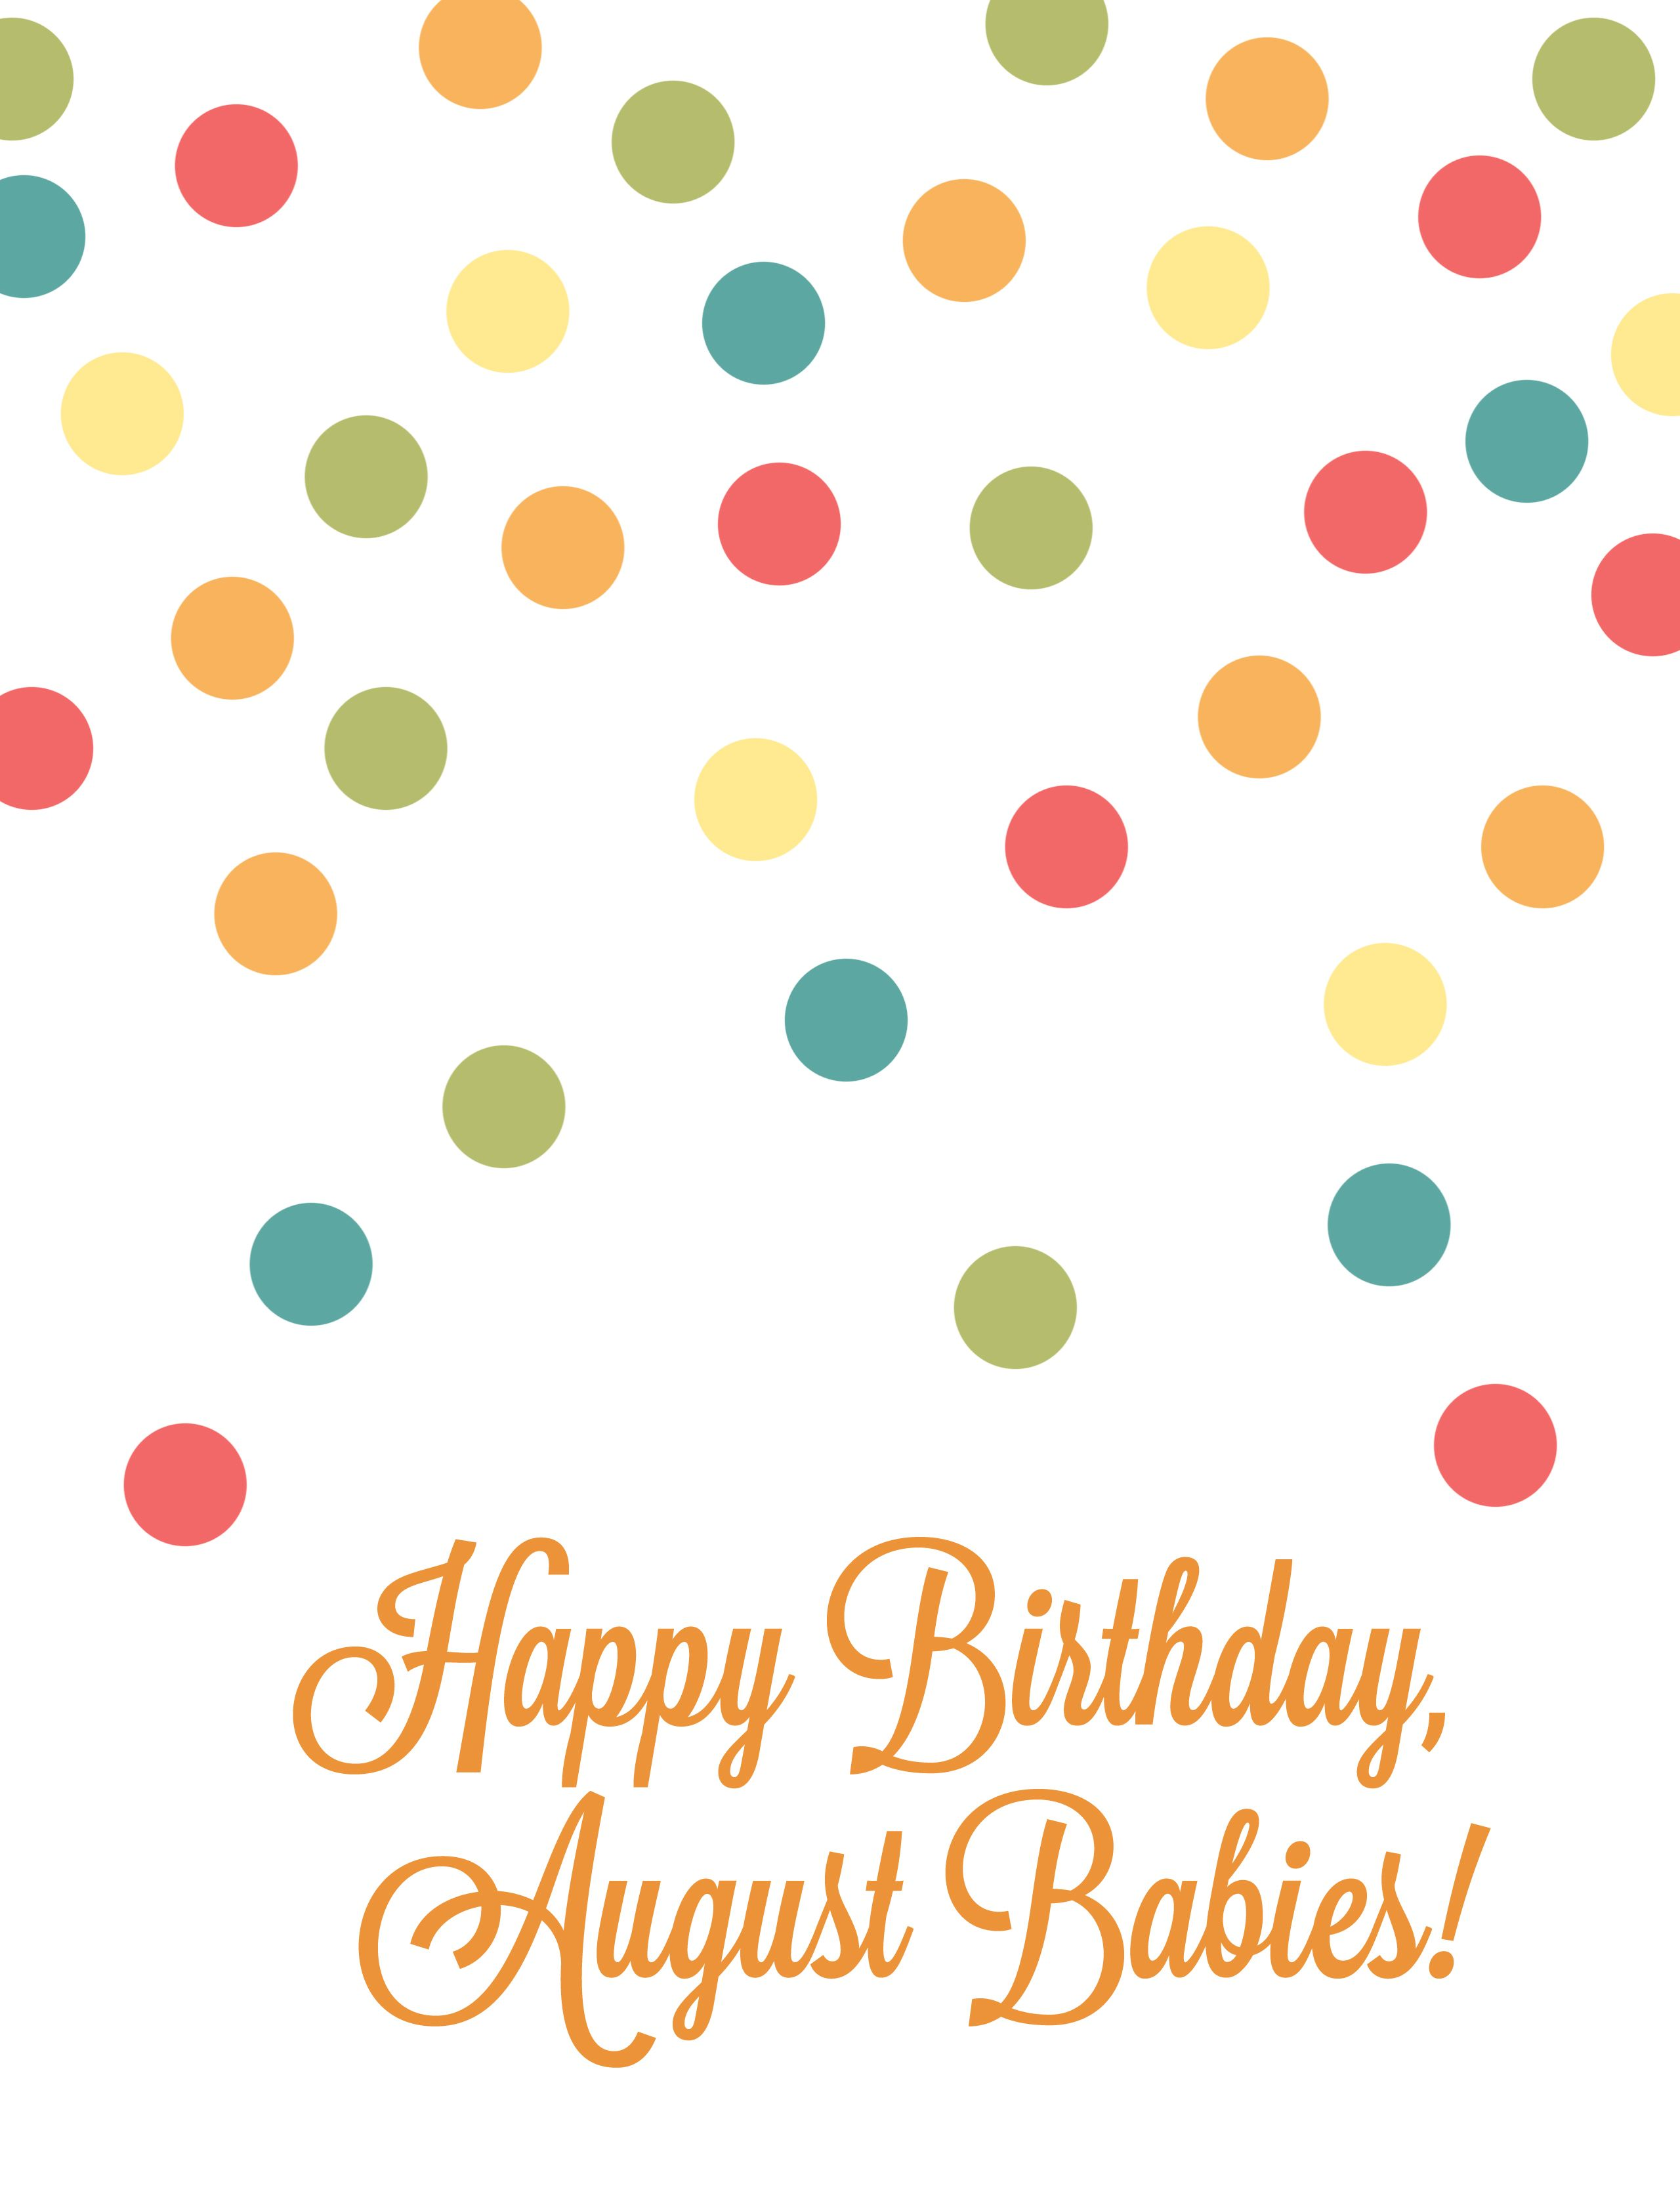 August 12 Birthdays   Famous Birthdays